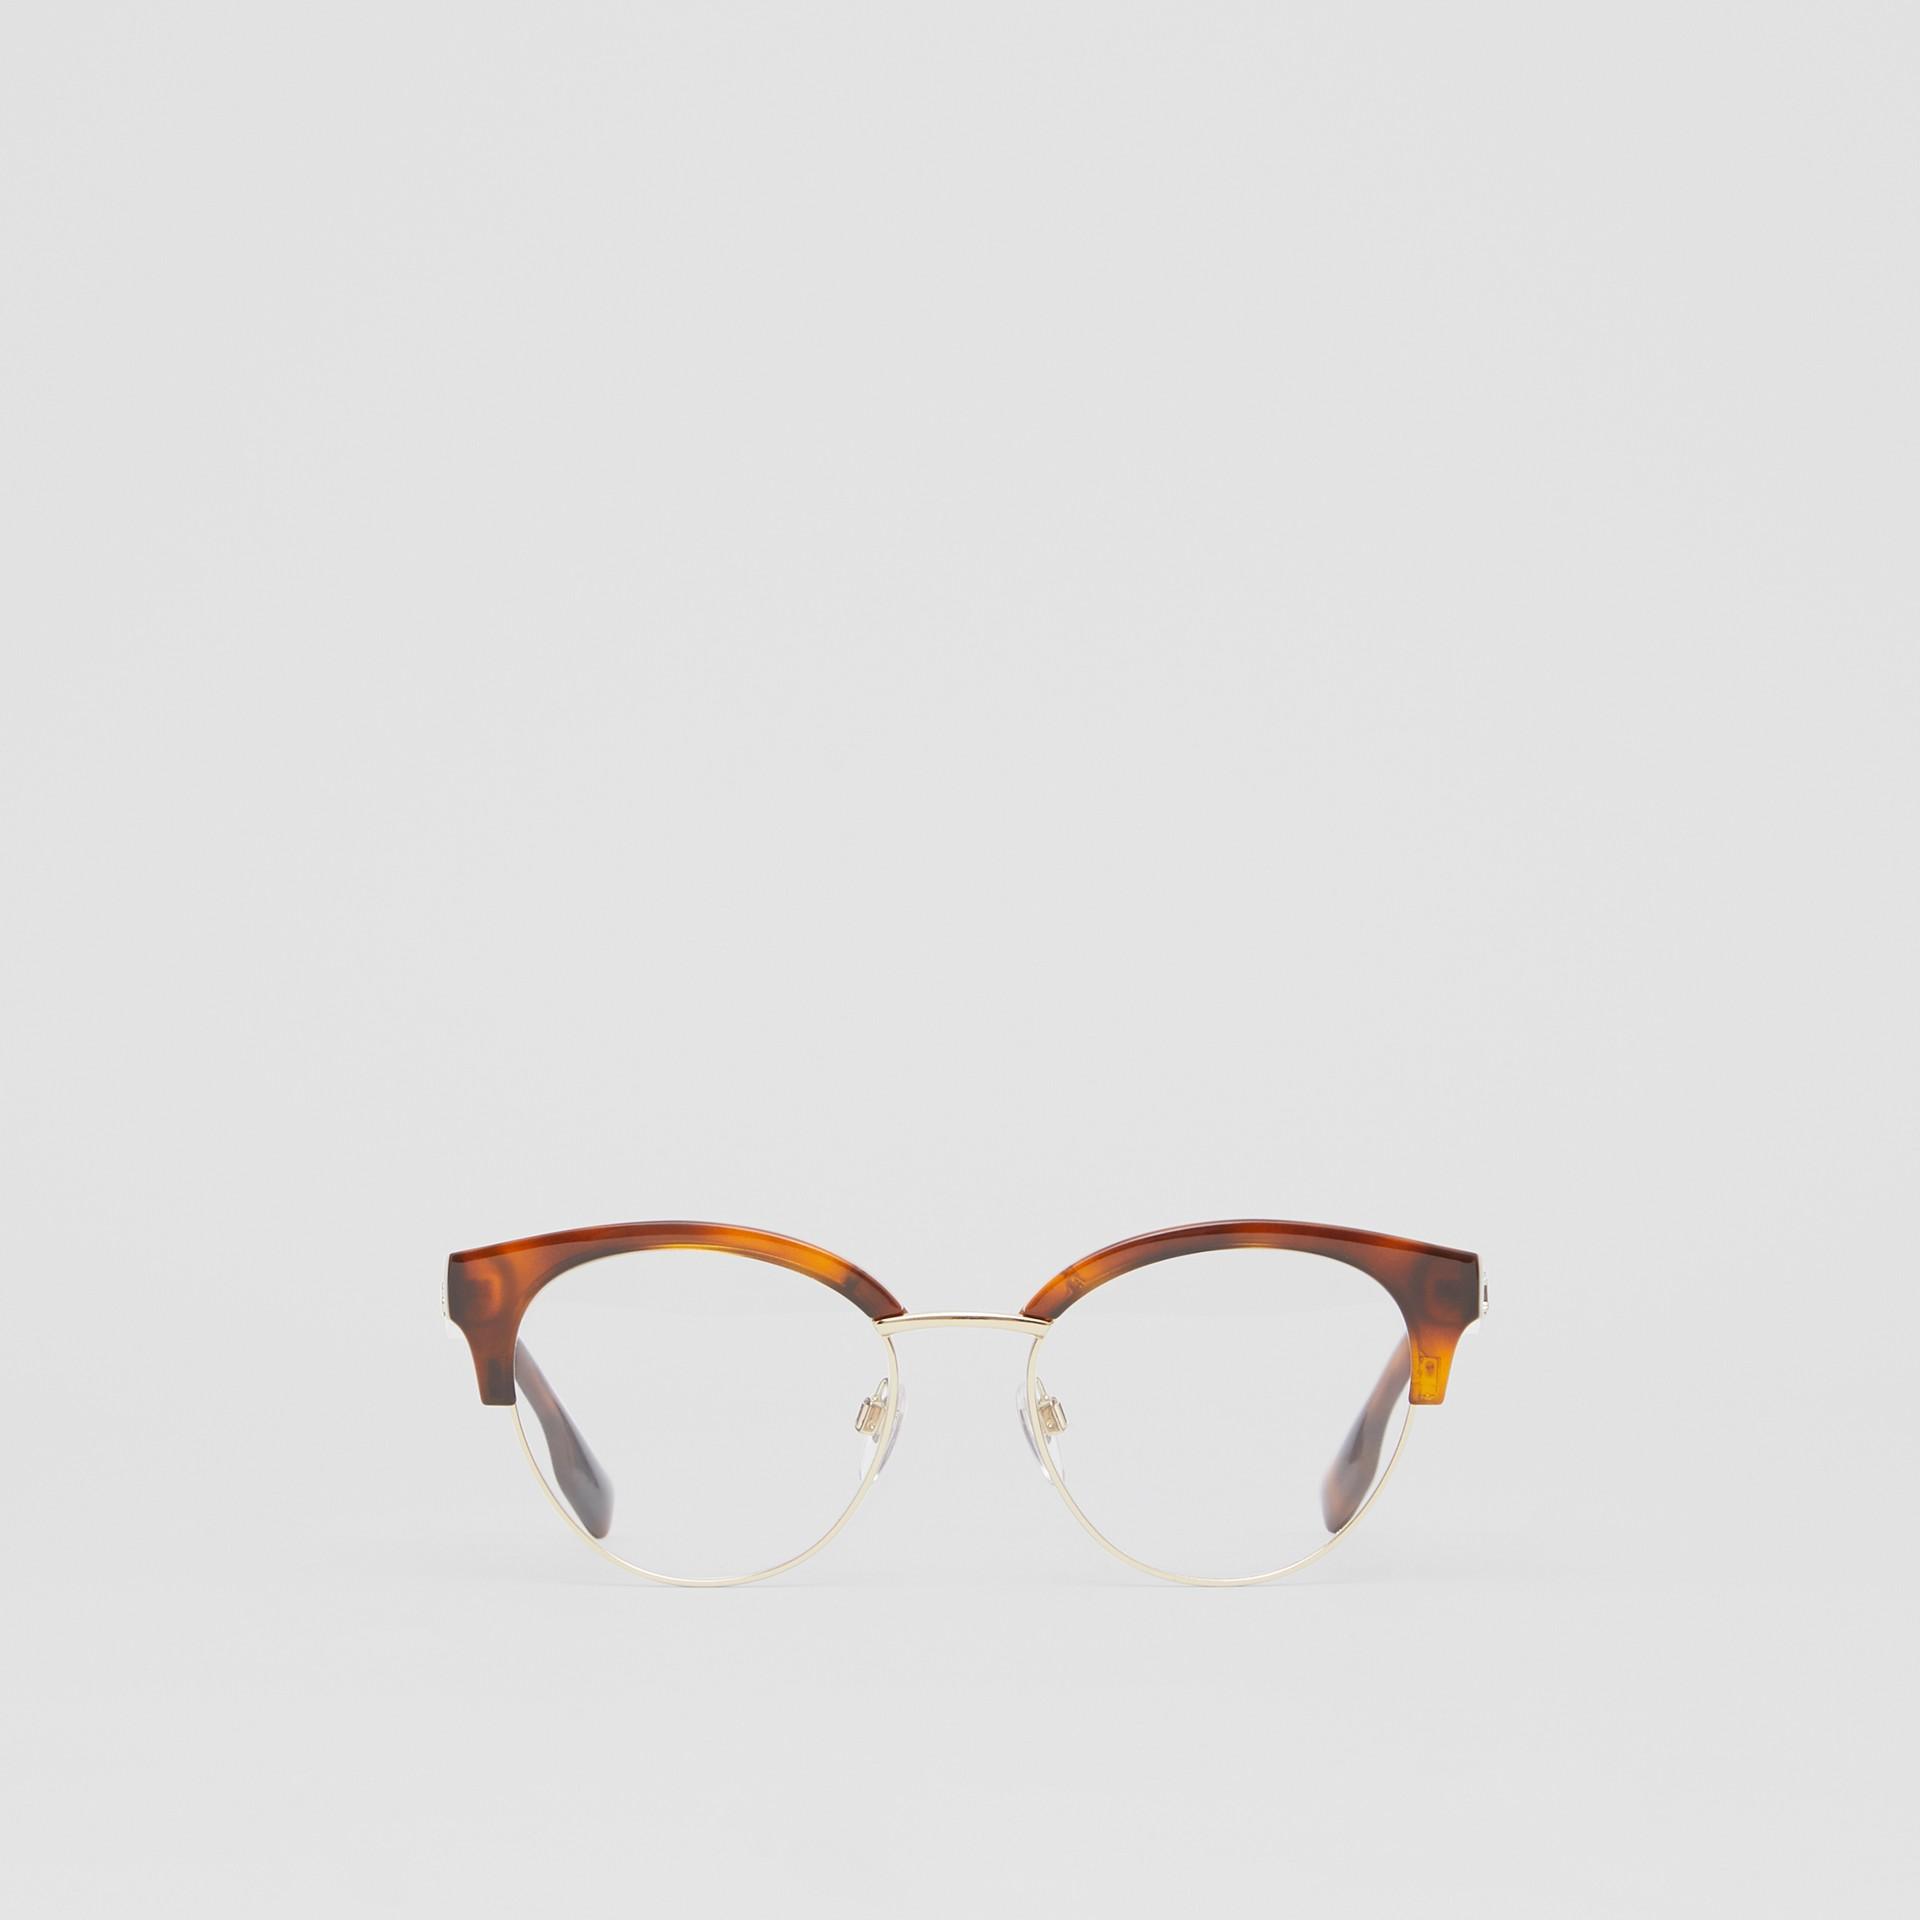 Cat-eye Optical Frames in Tortoise Amber - Women | Burberry - gallery image 0